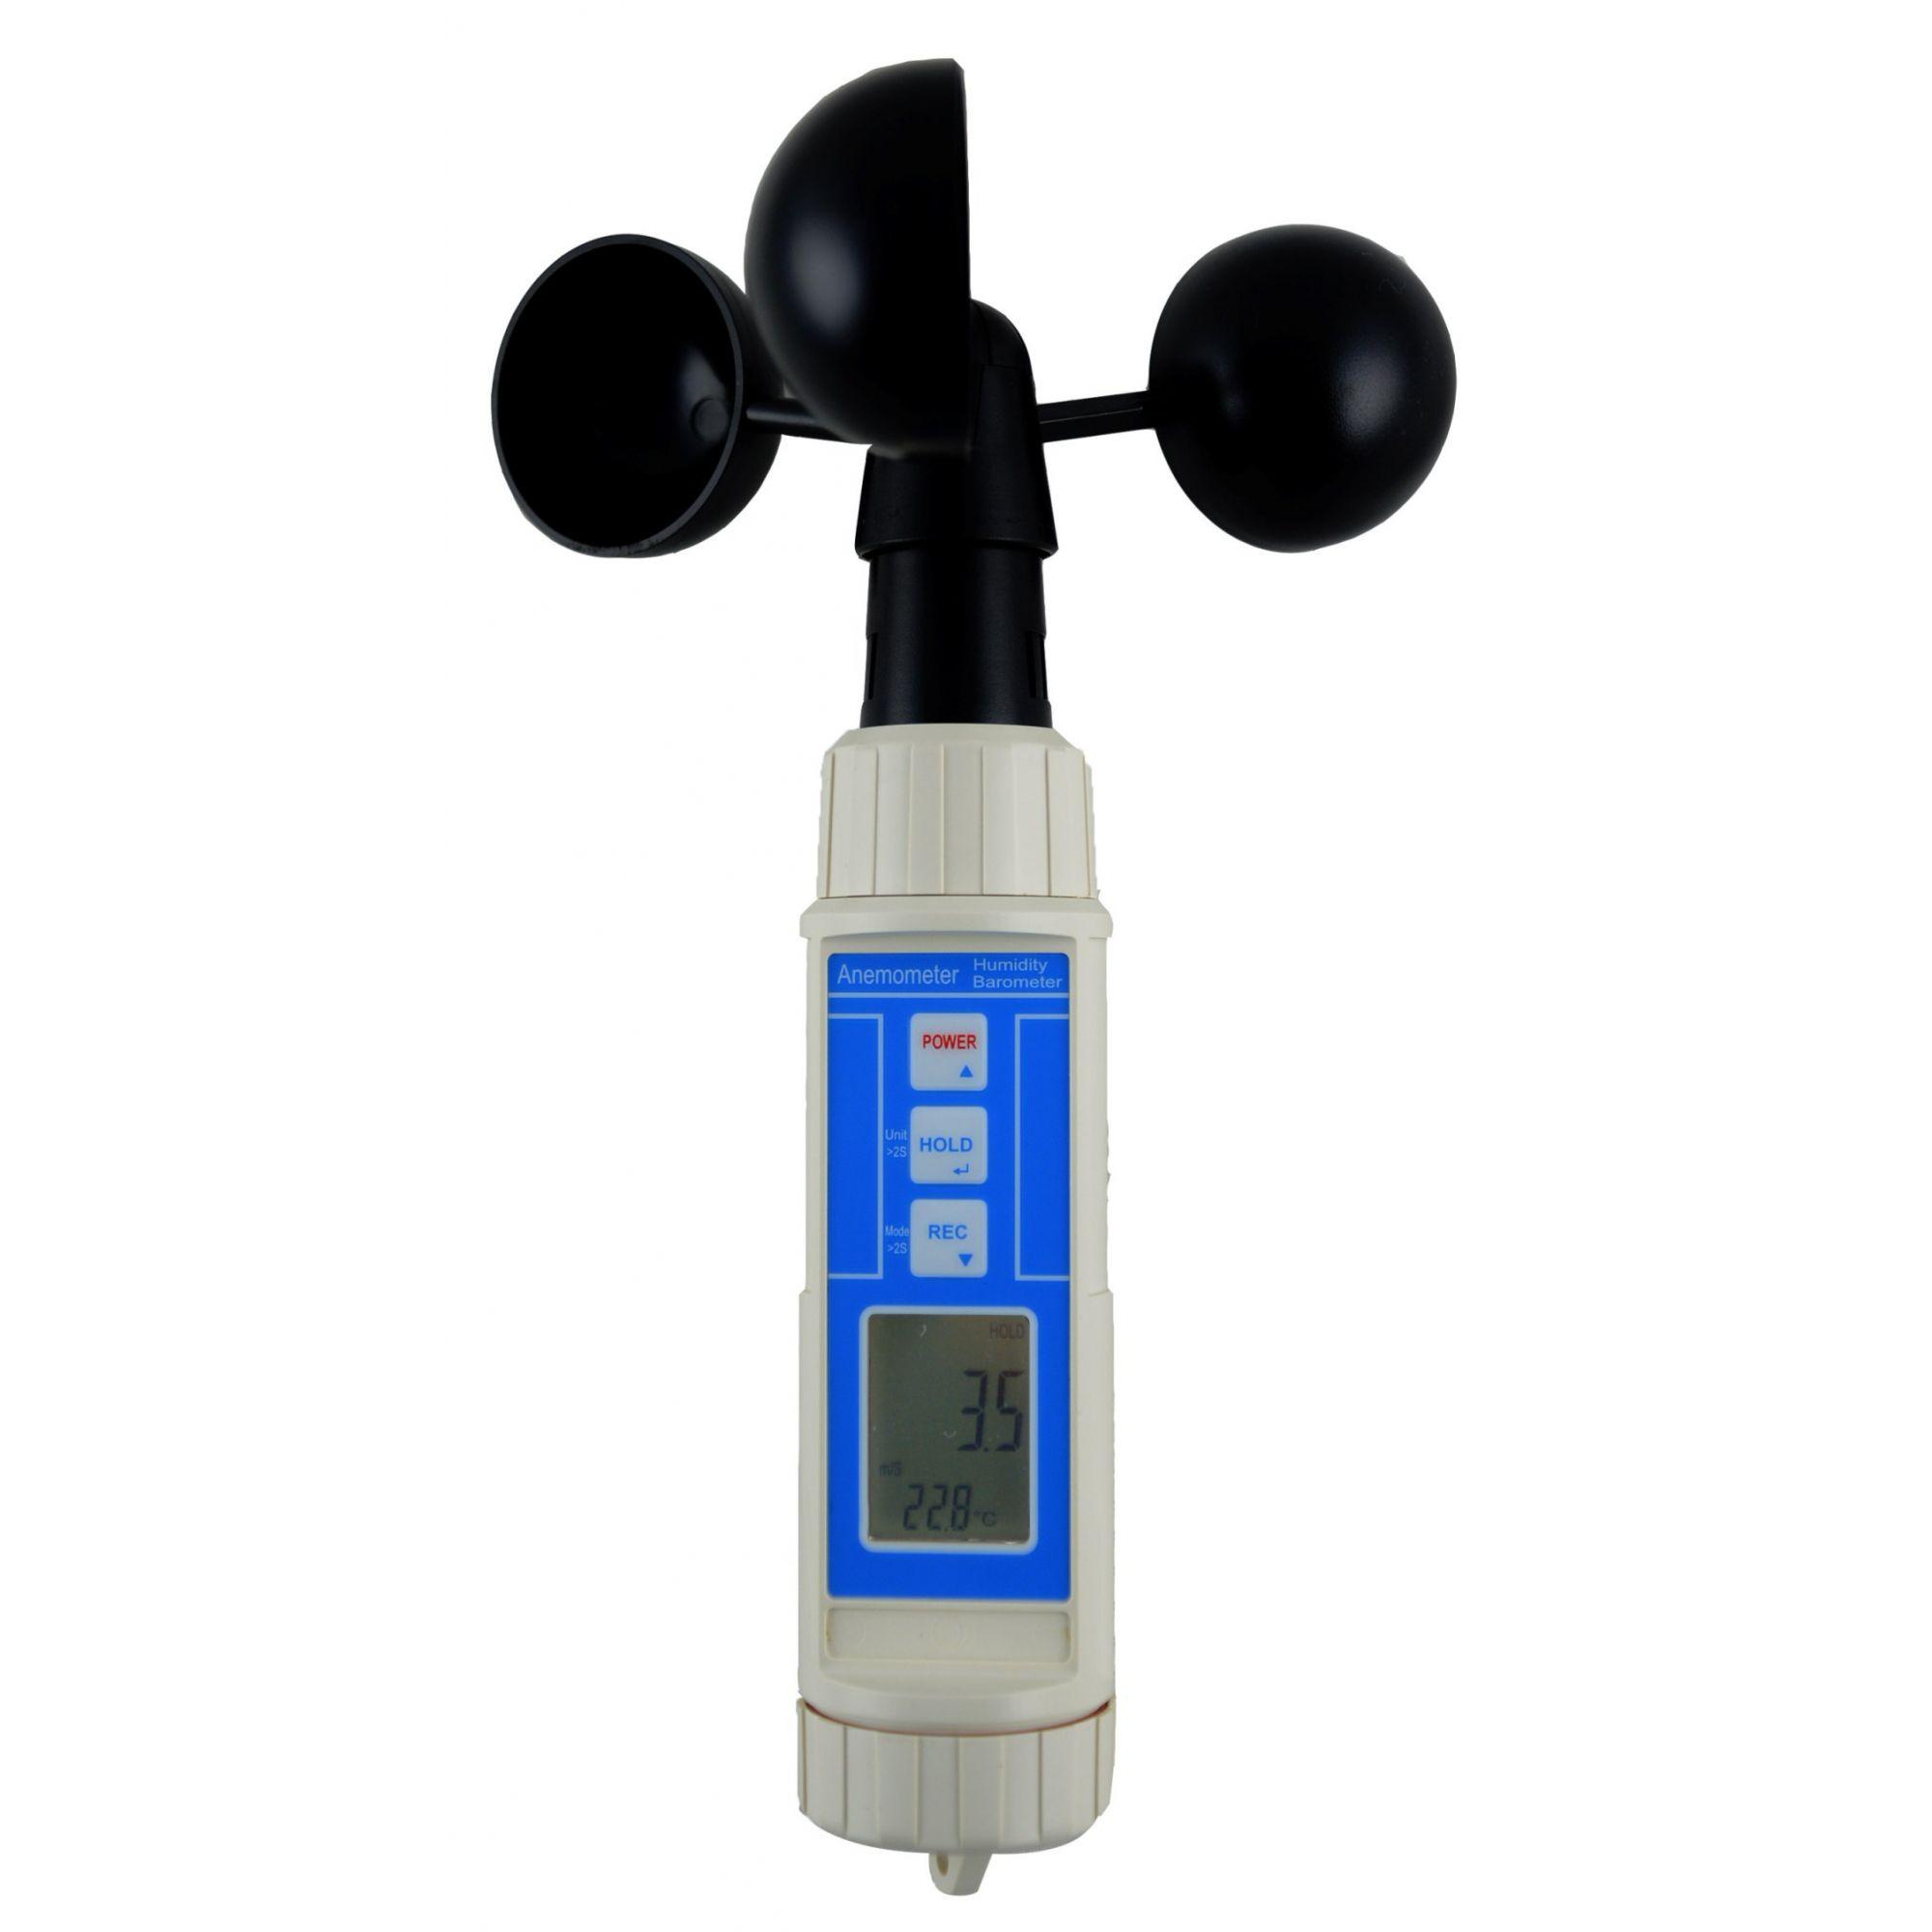 Termohigro Anemômetro Barômetro Digital Instrutherm THAB-500  - MRE Ferramentas